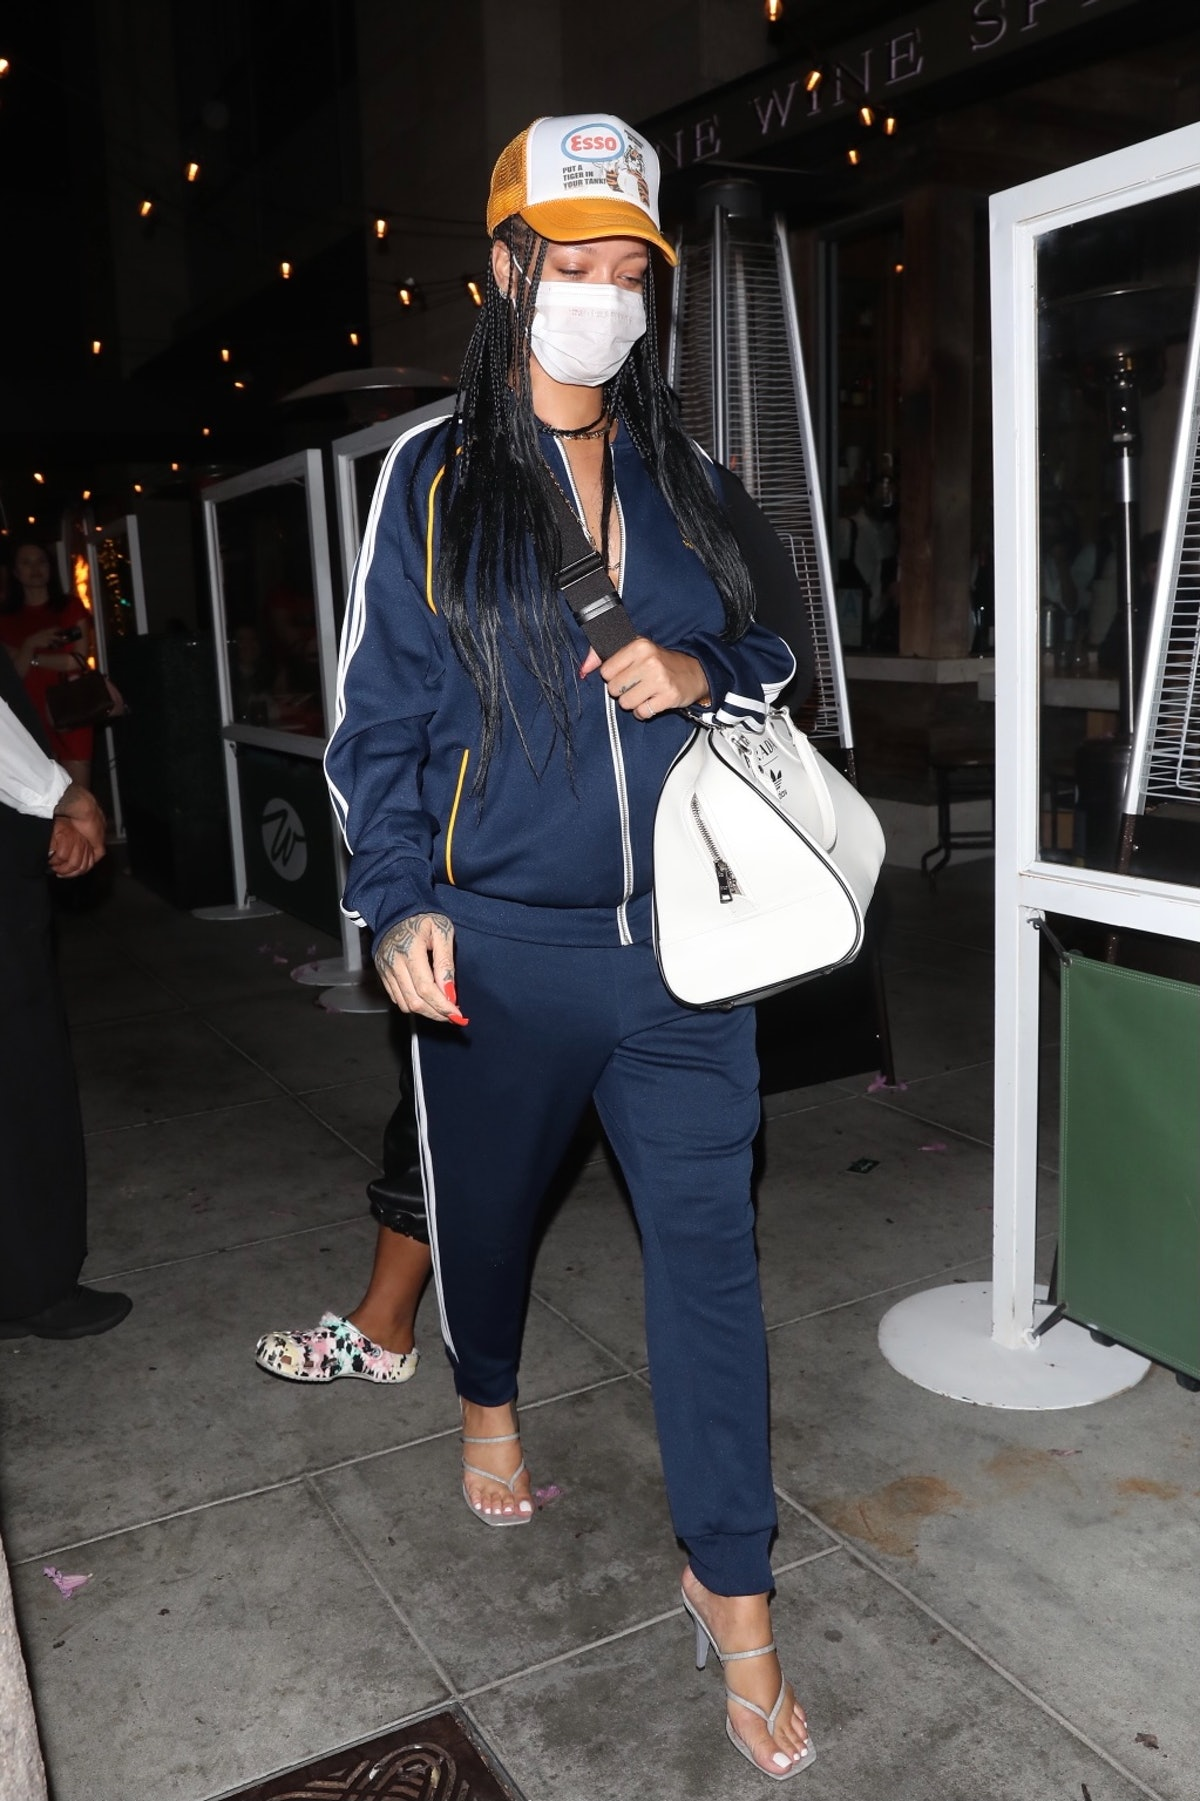 LOS ANGELES CA - APRIL 12:  Rihanna is seen at Wallys on April 12, 2021 in Los Angeles, California. ...